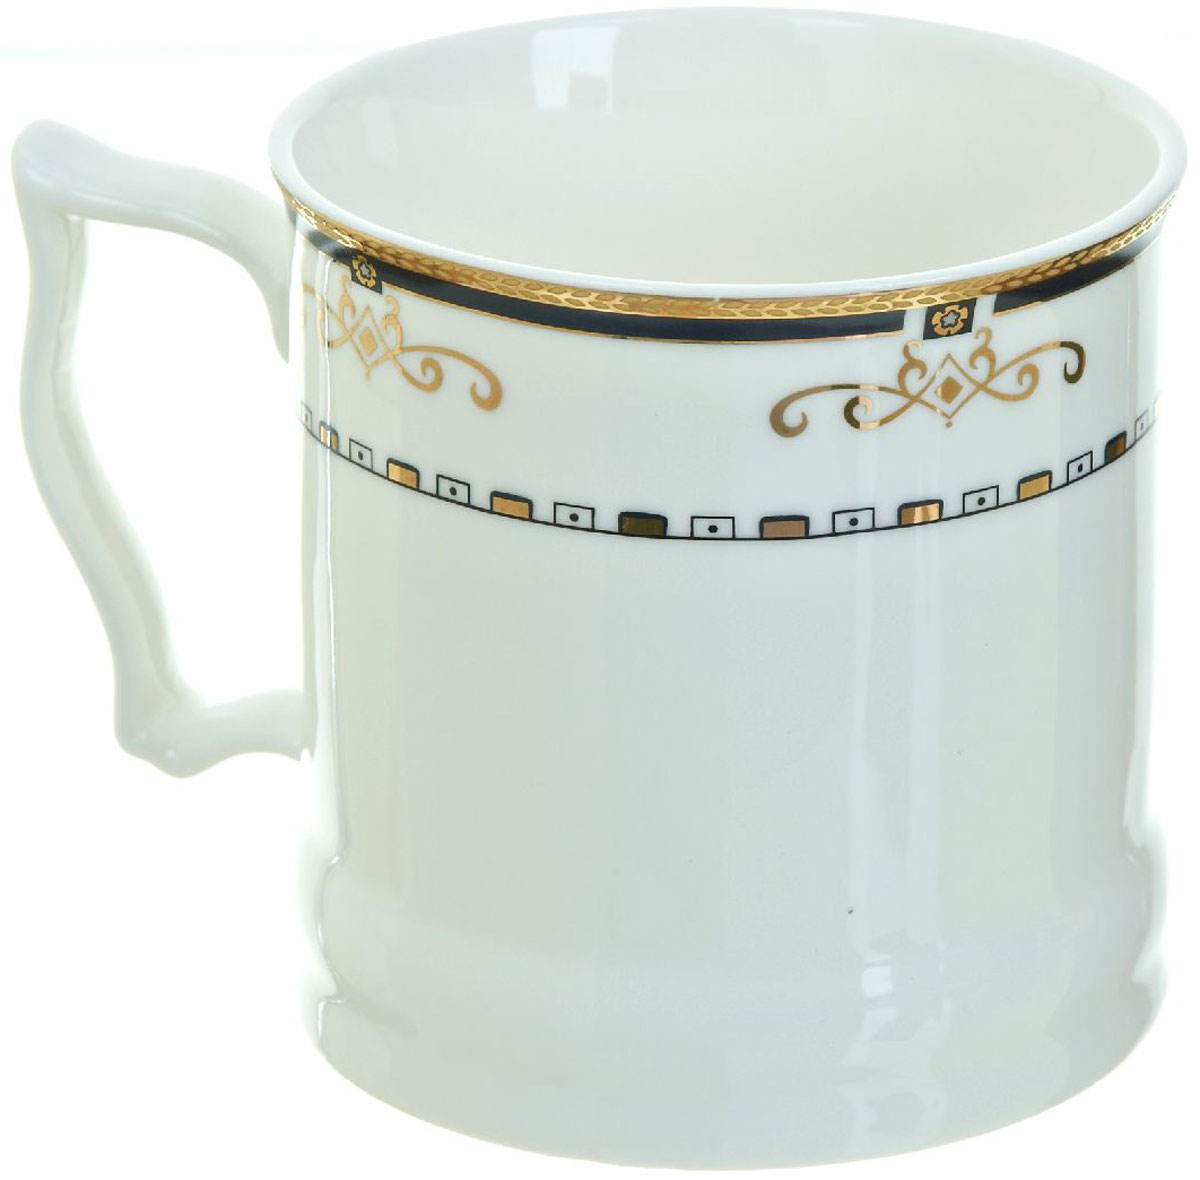 Кружка BHP Королевская кружка, 500 мл. 1870005 кружка amber porcelain сердечки 220 мл